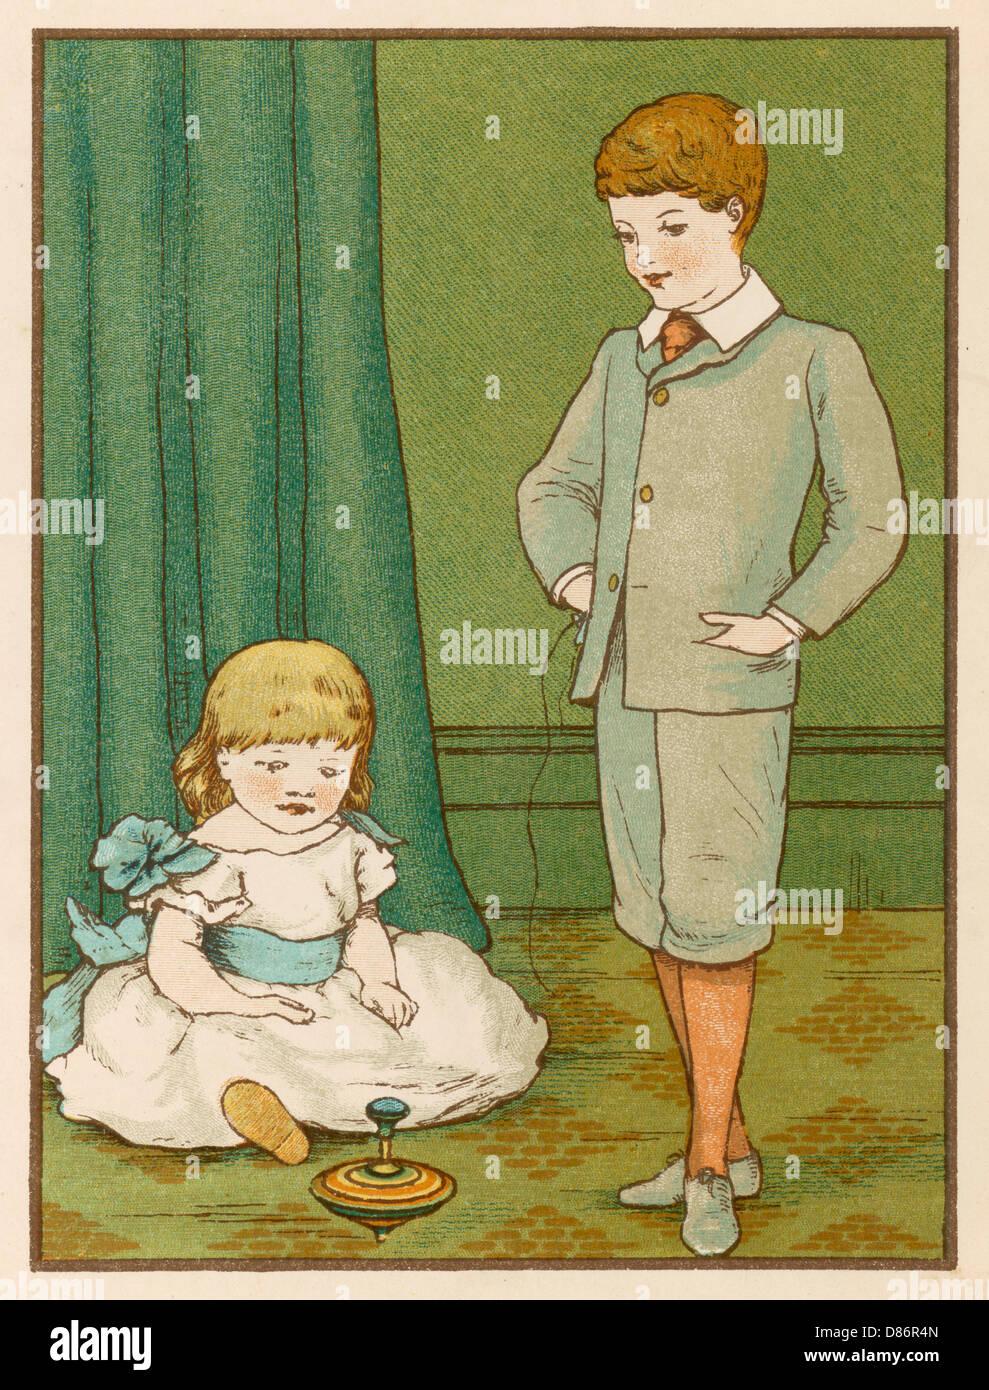 Humming Top 1886 - Stock Image